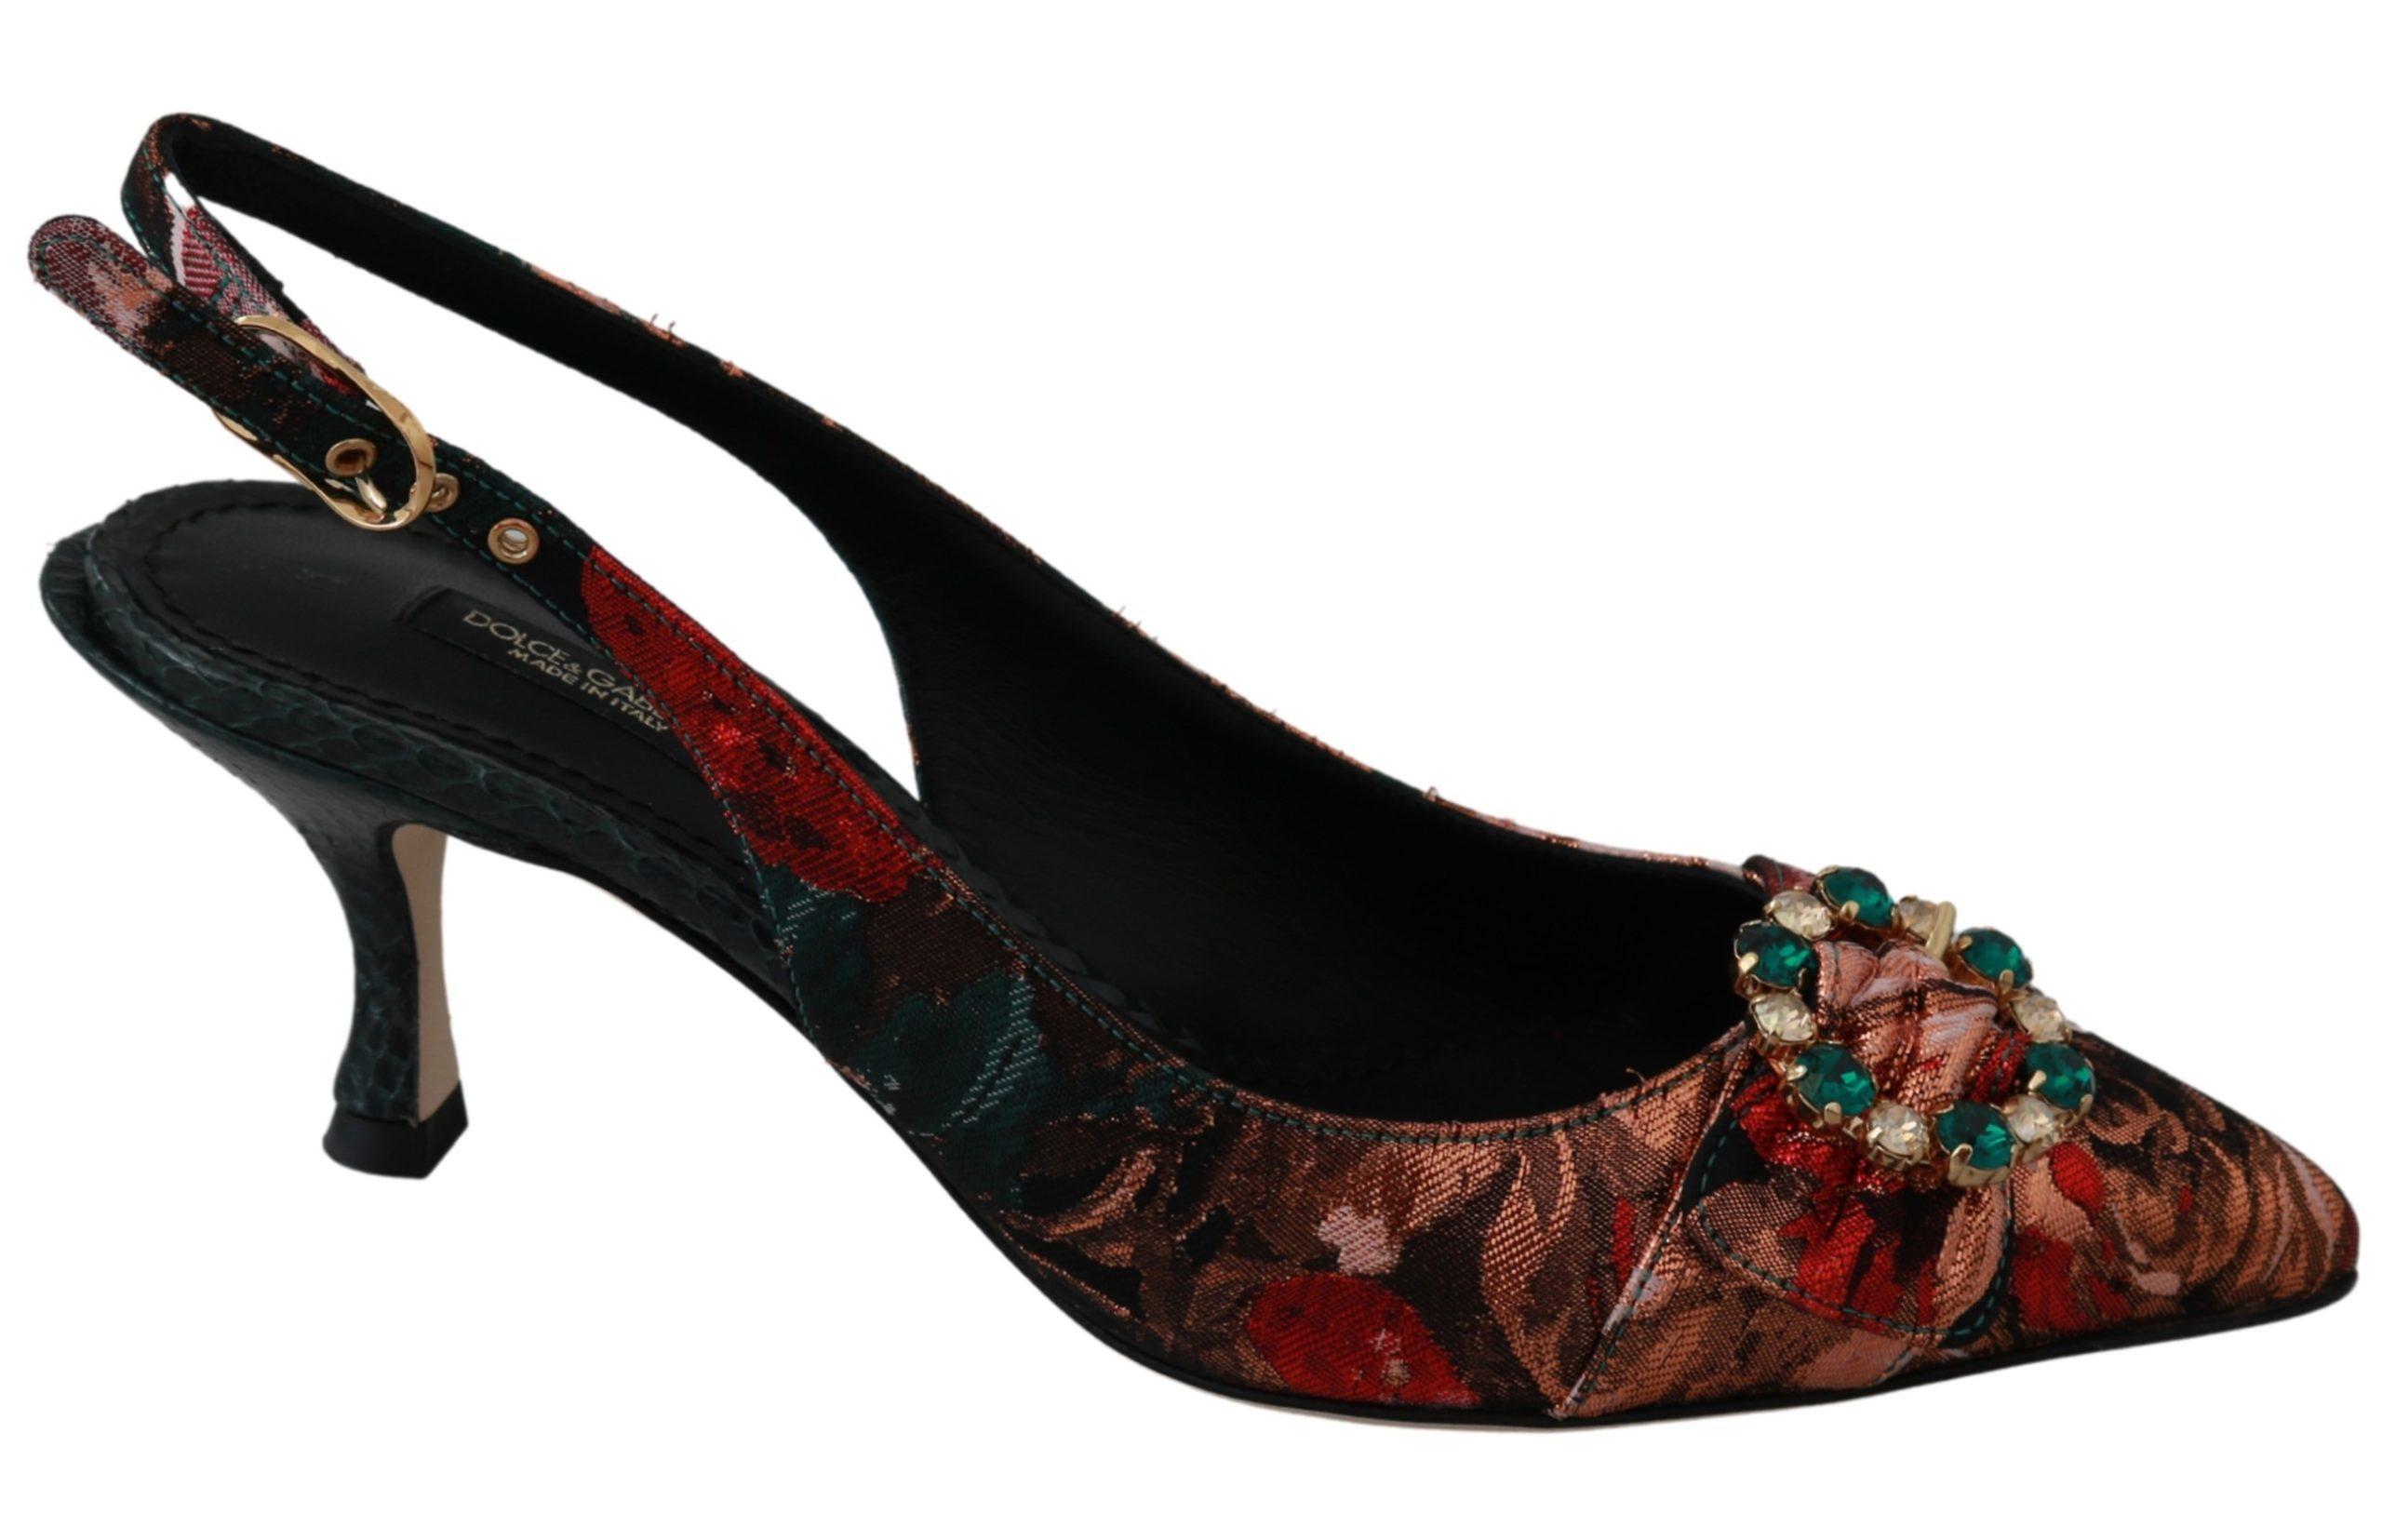 Dolce & Gabbana Women's Crystal Heels Shoes Multicolor LA6419 - EU36/US5.5